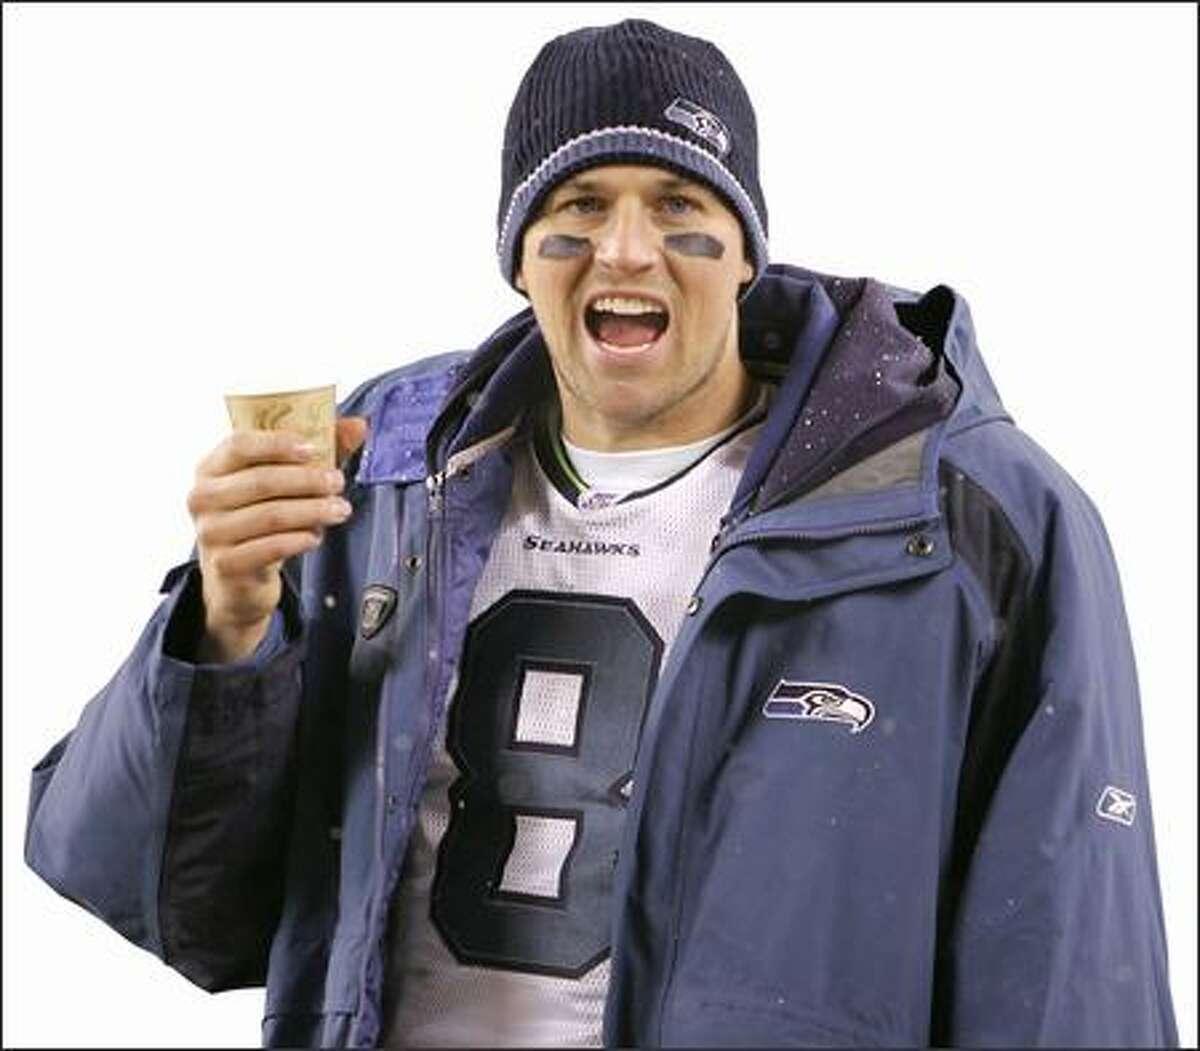 Seahawks quarterback Matt Hasselbeck.